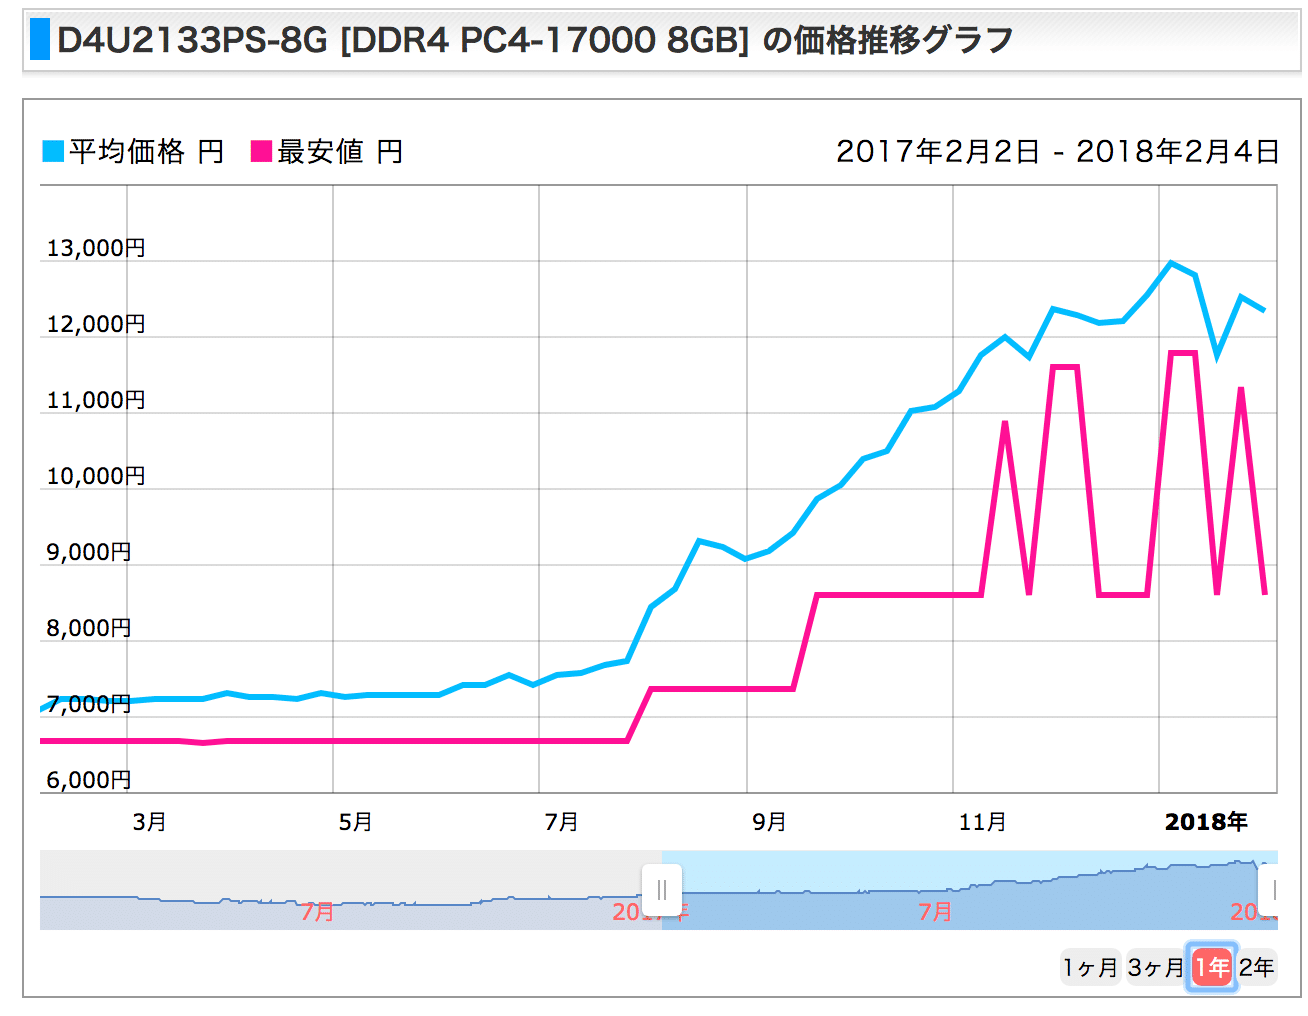 CFD_D4U2133PS-8G__DDR4_PC4-17000_8GB__価格推移グラフ